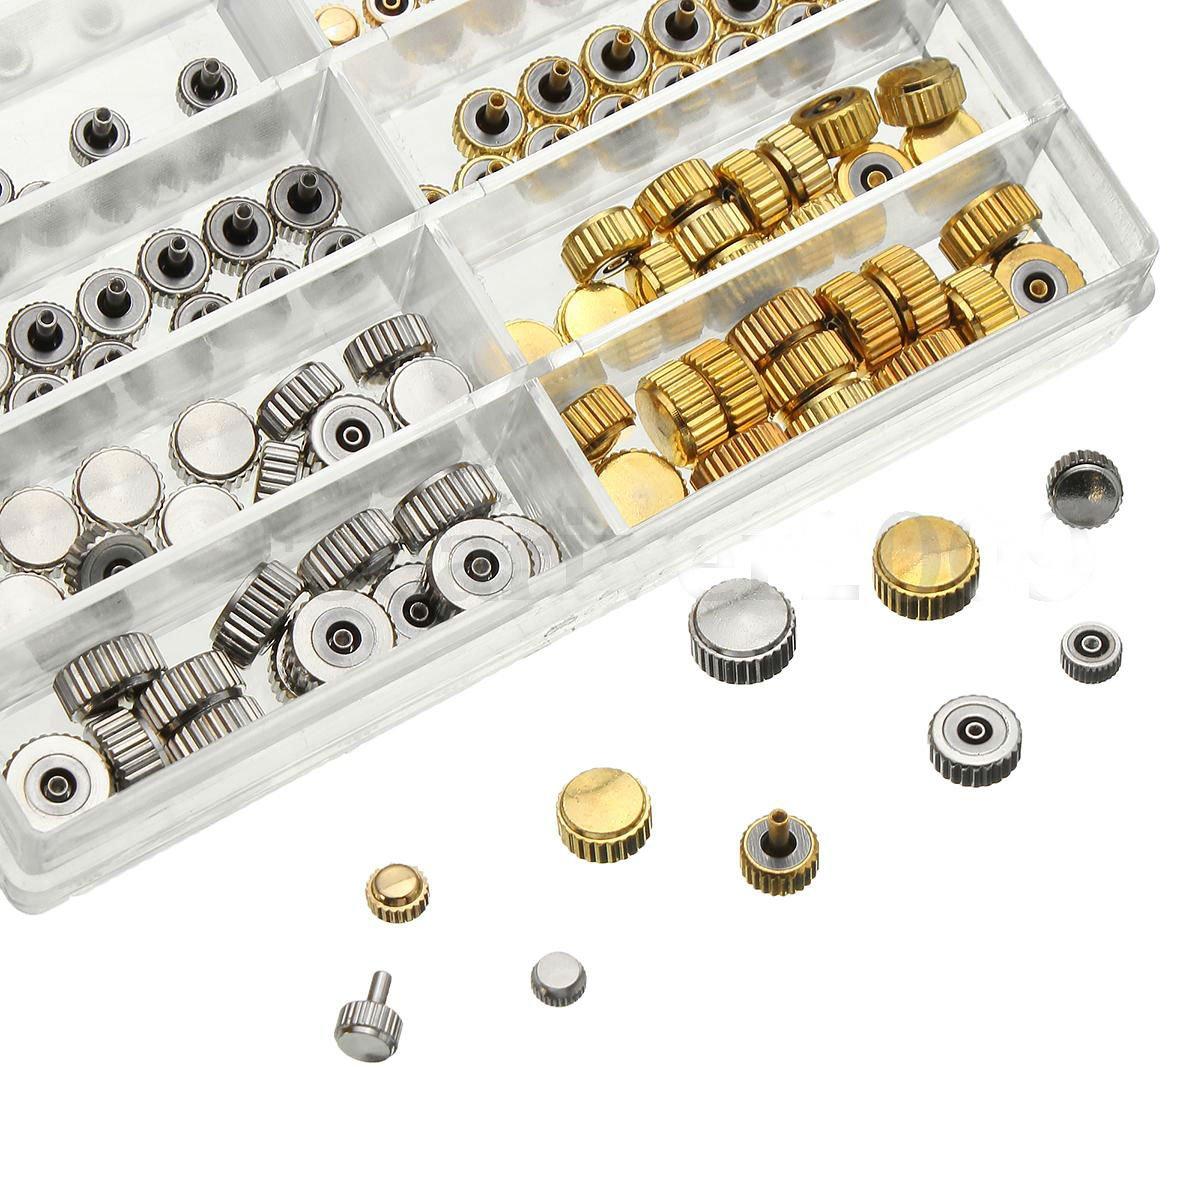 150pcs Mixed Silver Gold Watch Crown Repair Parts Tool 10 Size Assortment Set ddb